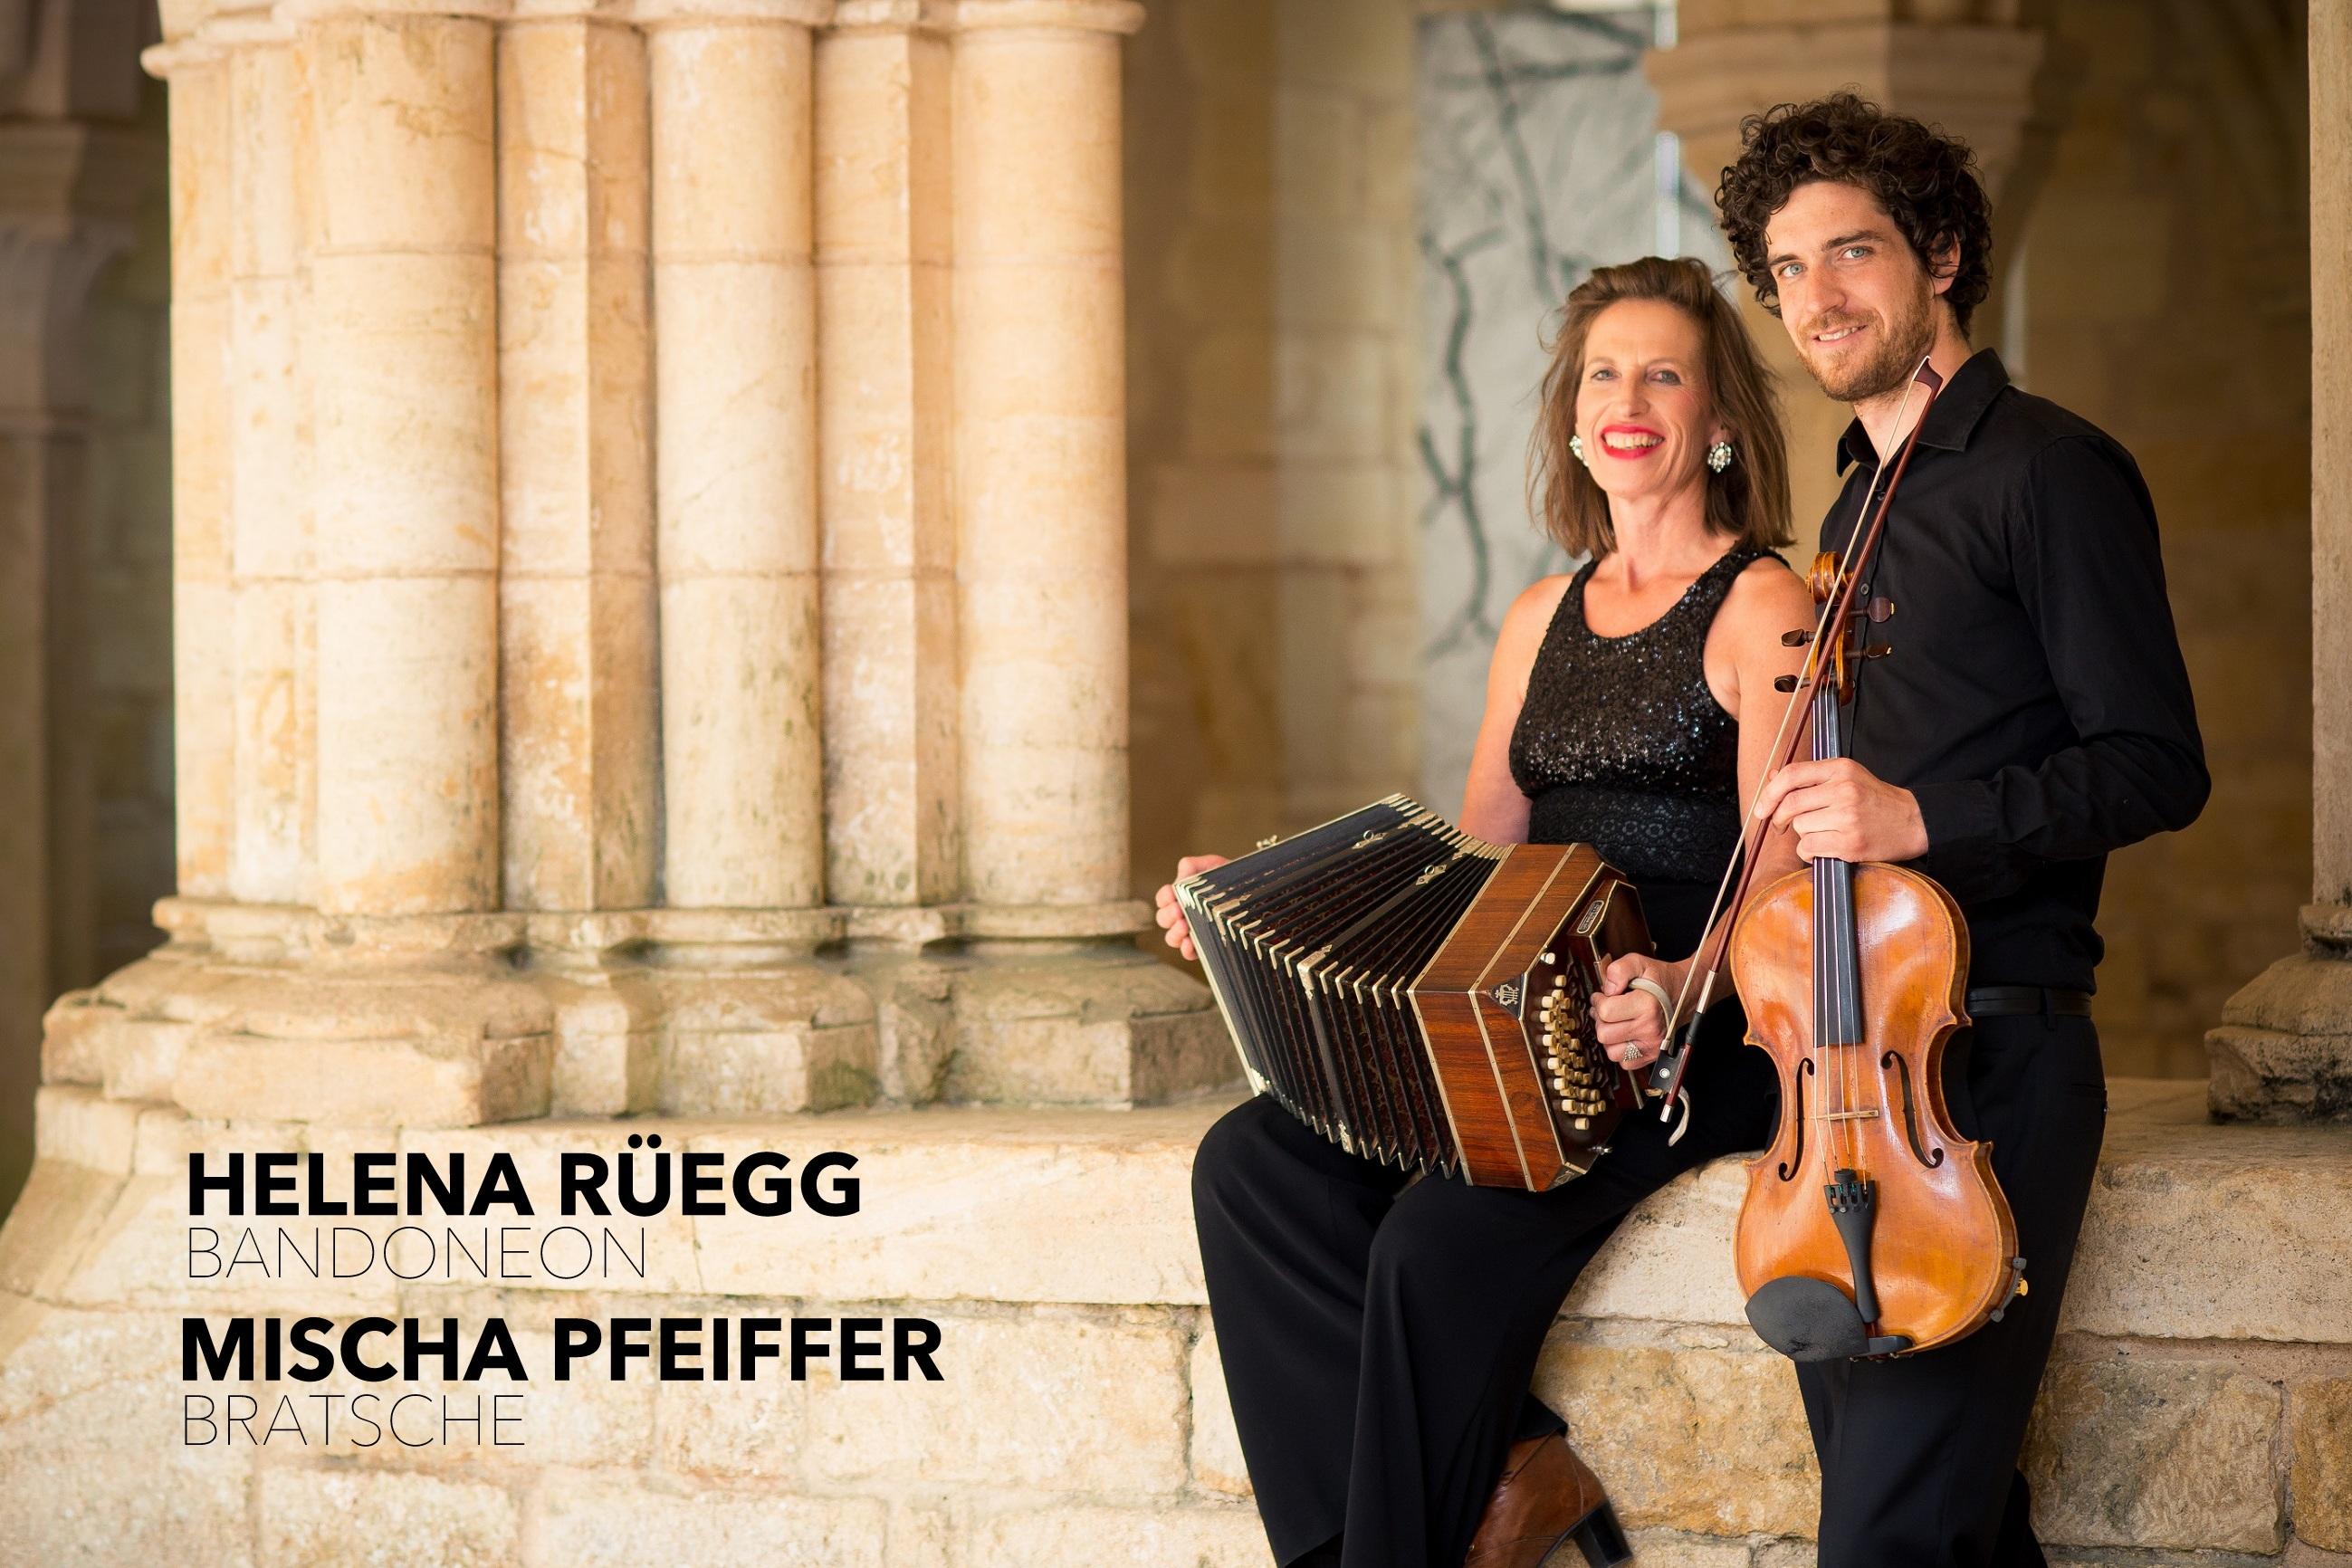 Helena Rüegg & Mischa Pfeiffer